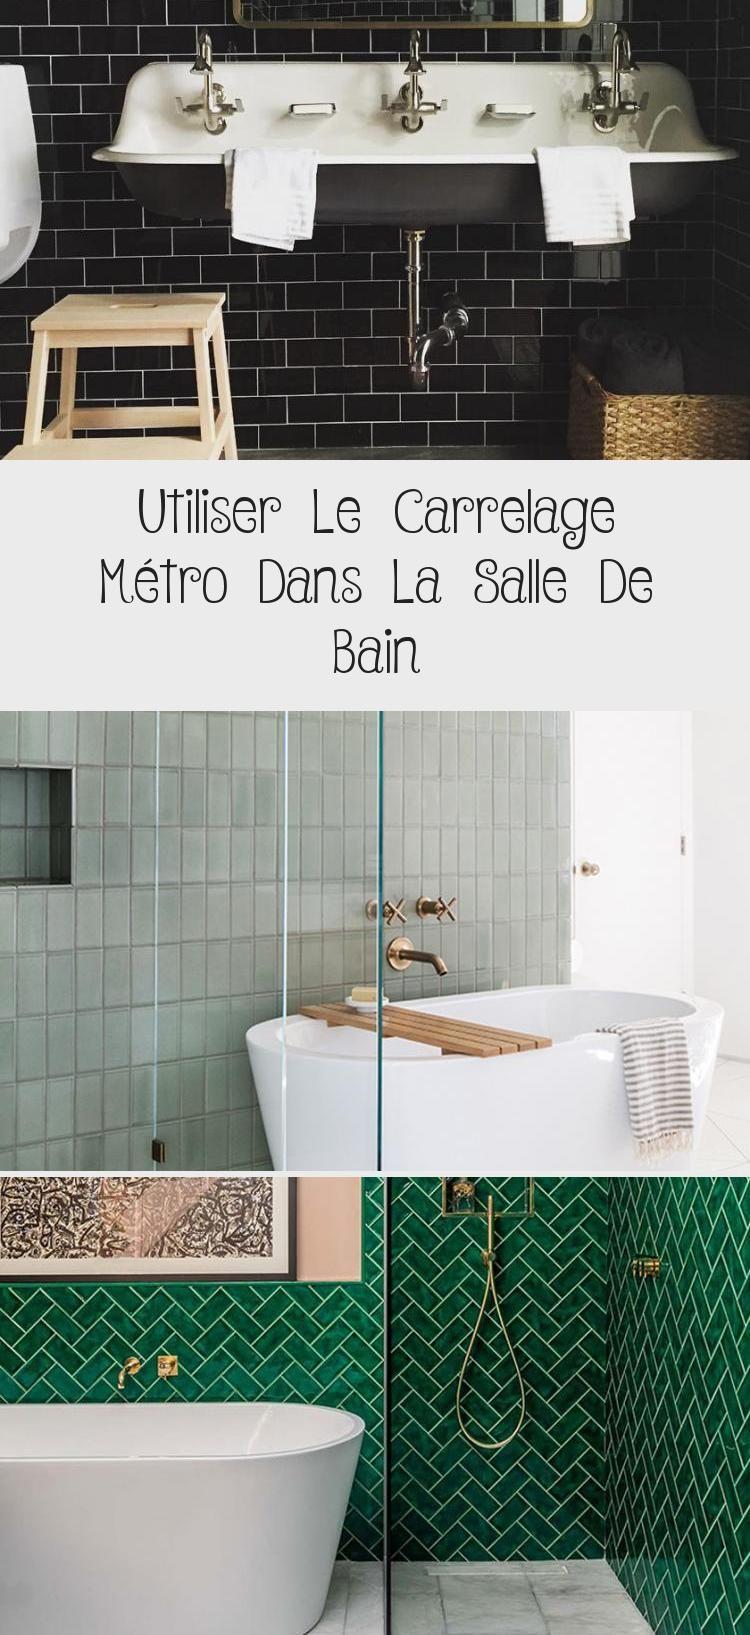 Utiliser Le Carrelage Metro Dans La Salle De Bain In 2020 Vanity